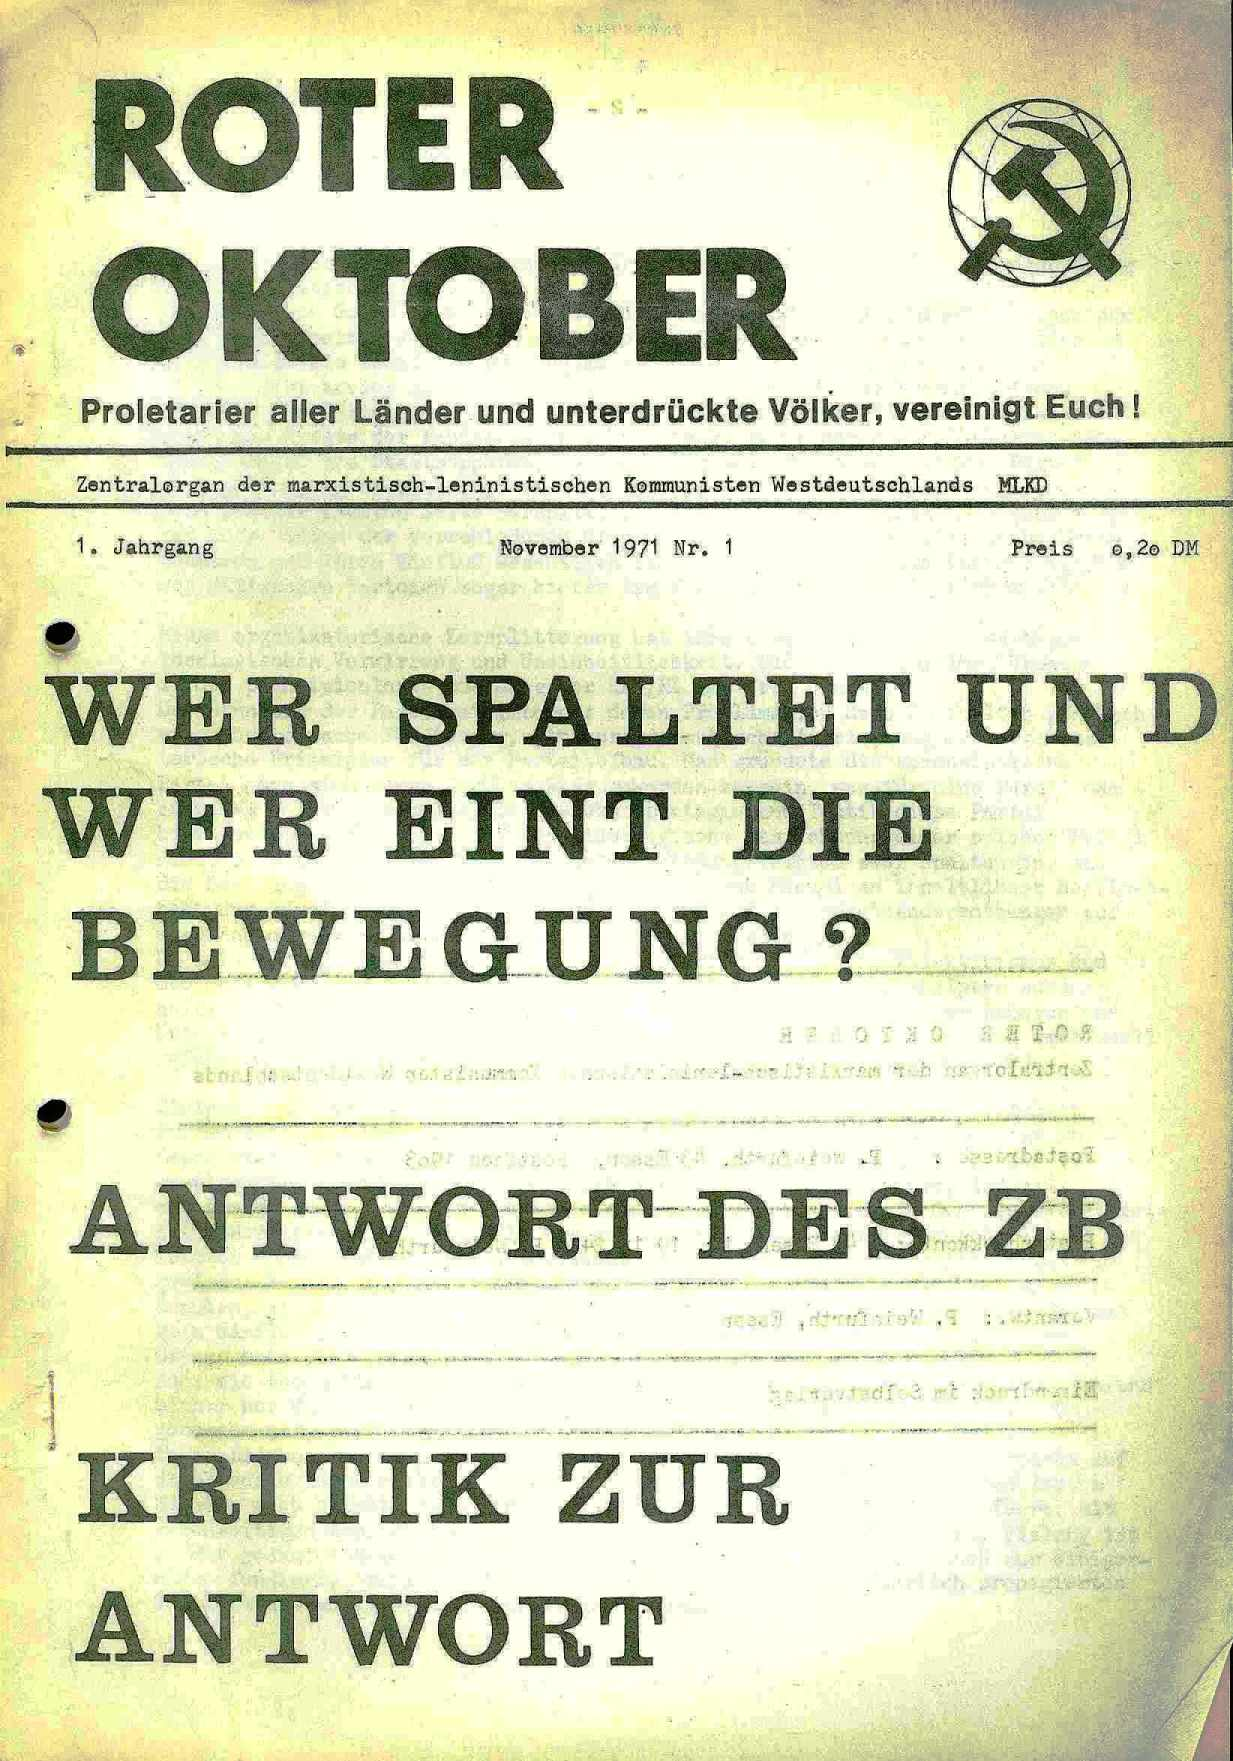 Weinfurth097